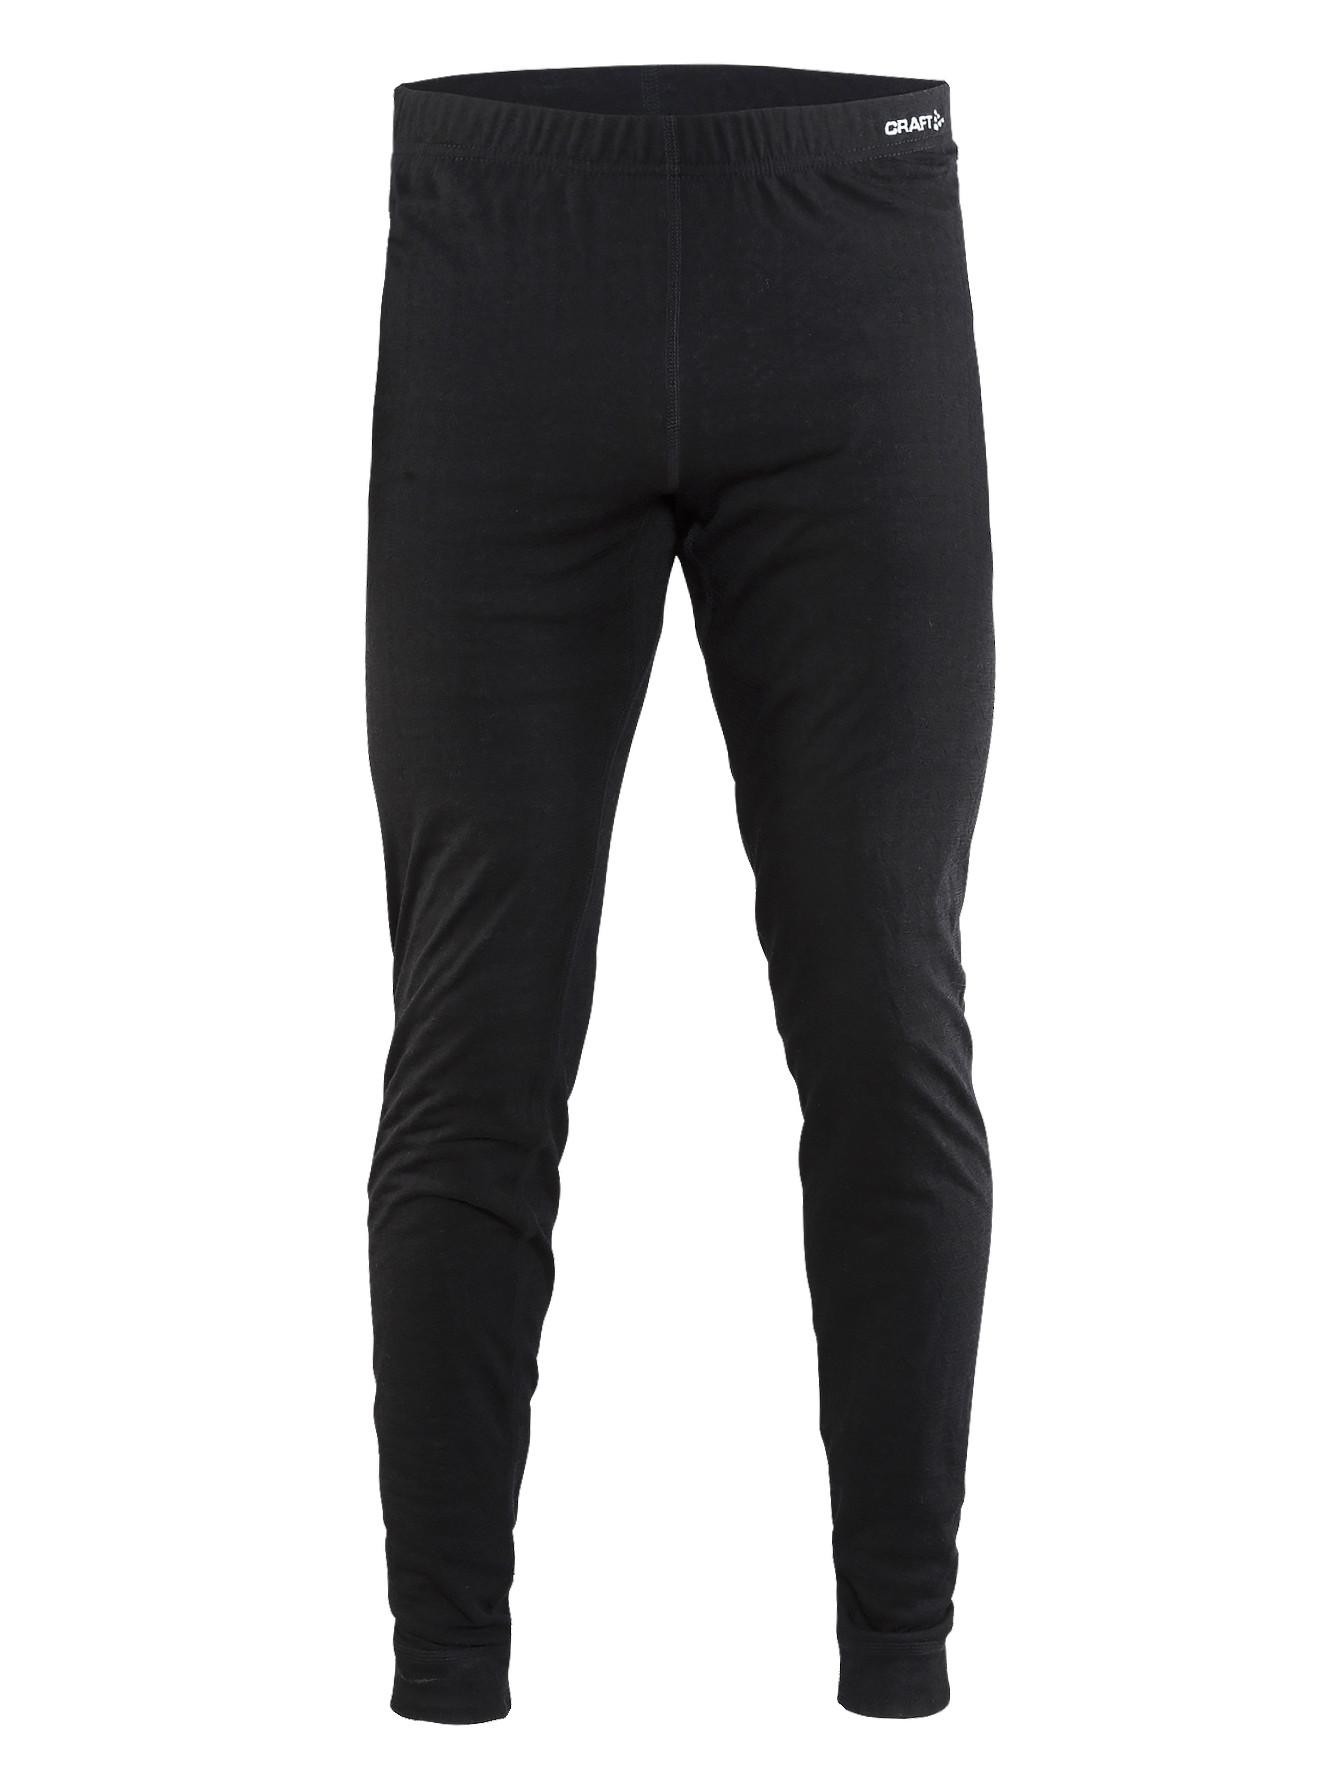 Термоштаны Craft Nordic Wool Pants M Black/Dark Grey Melange S